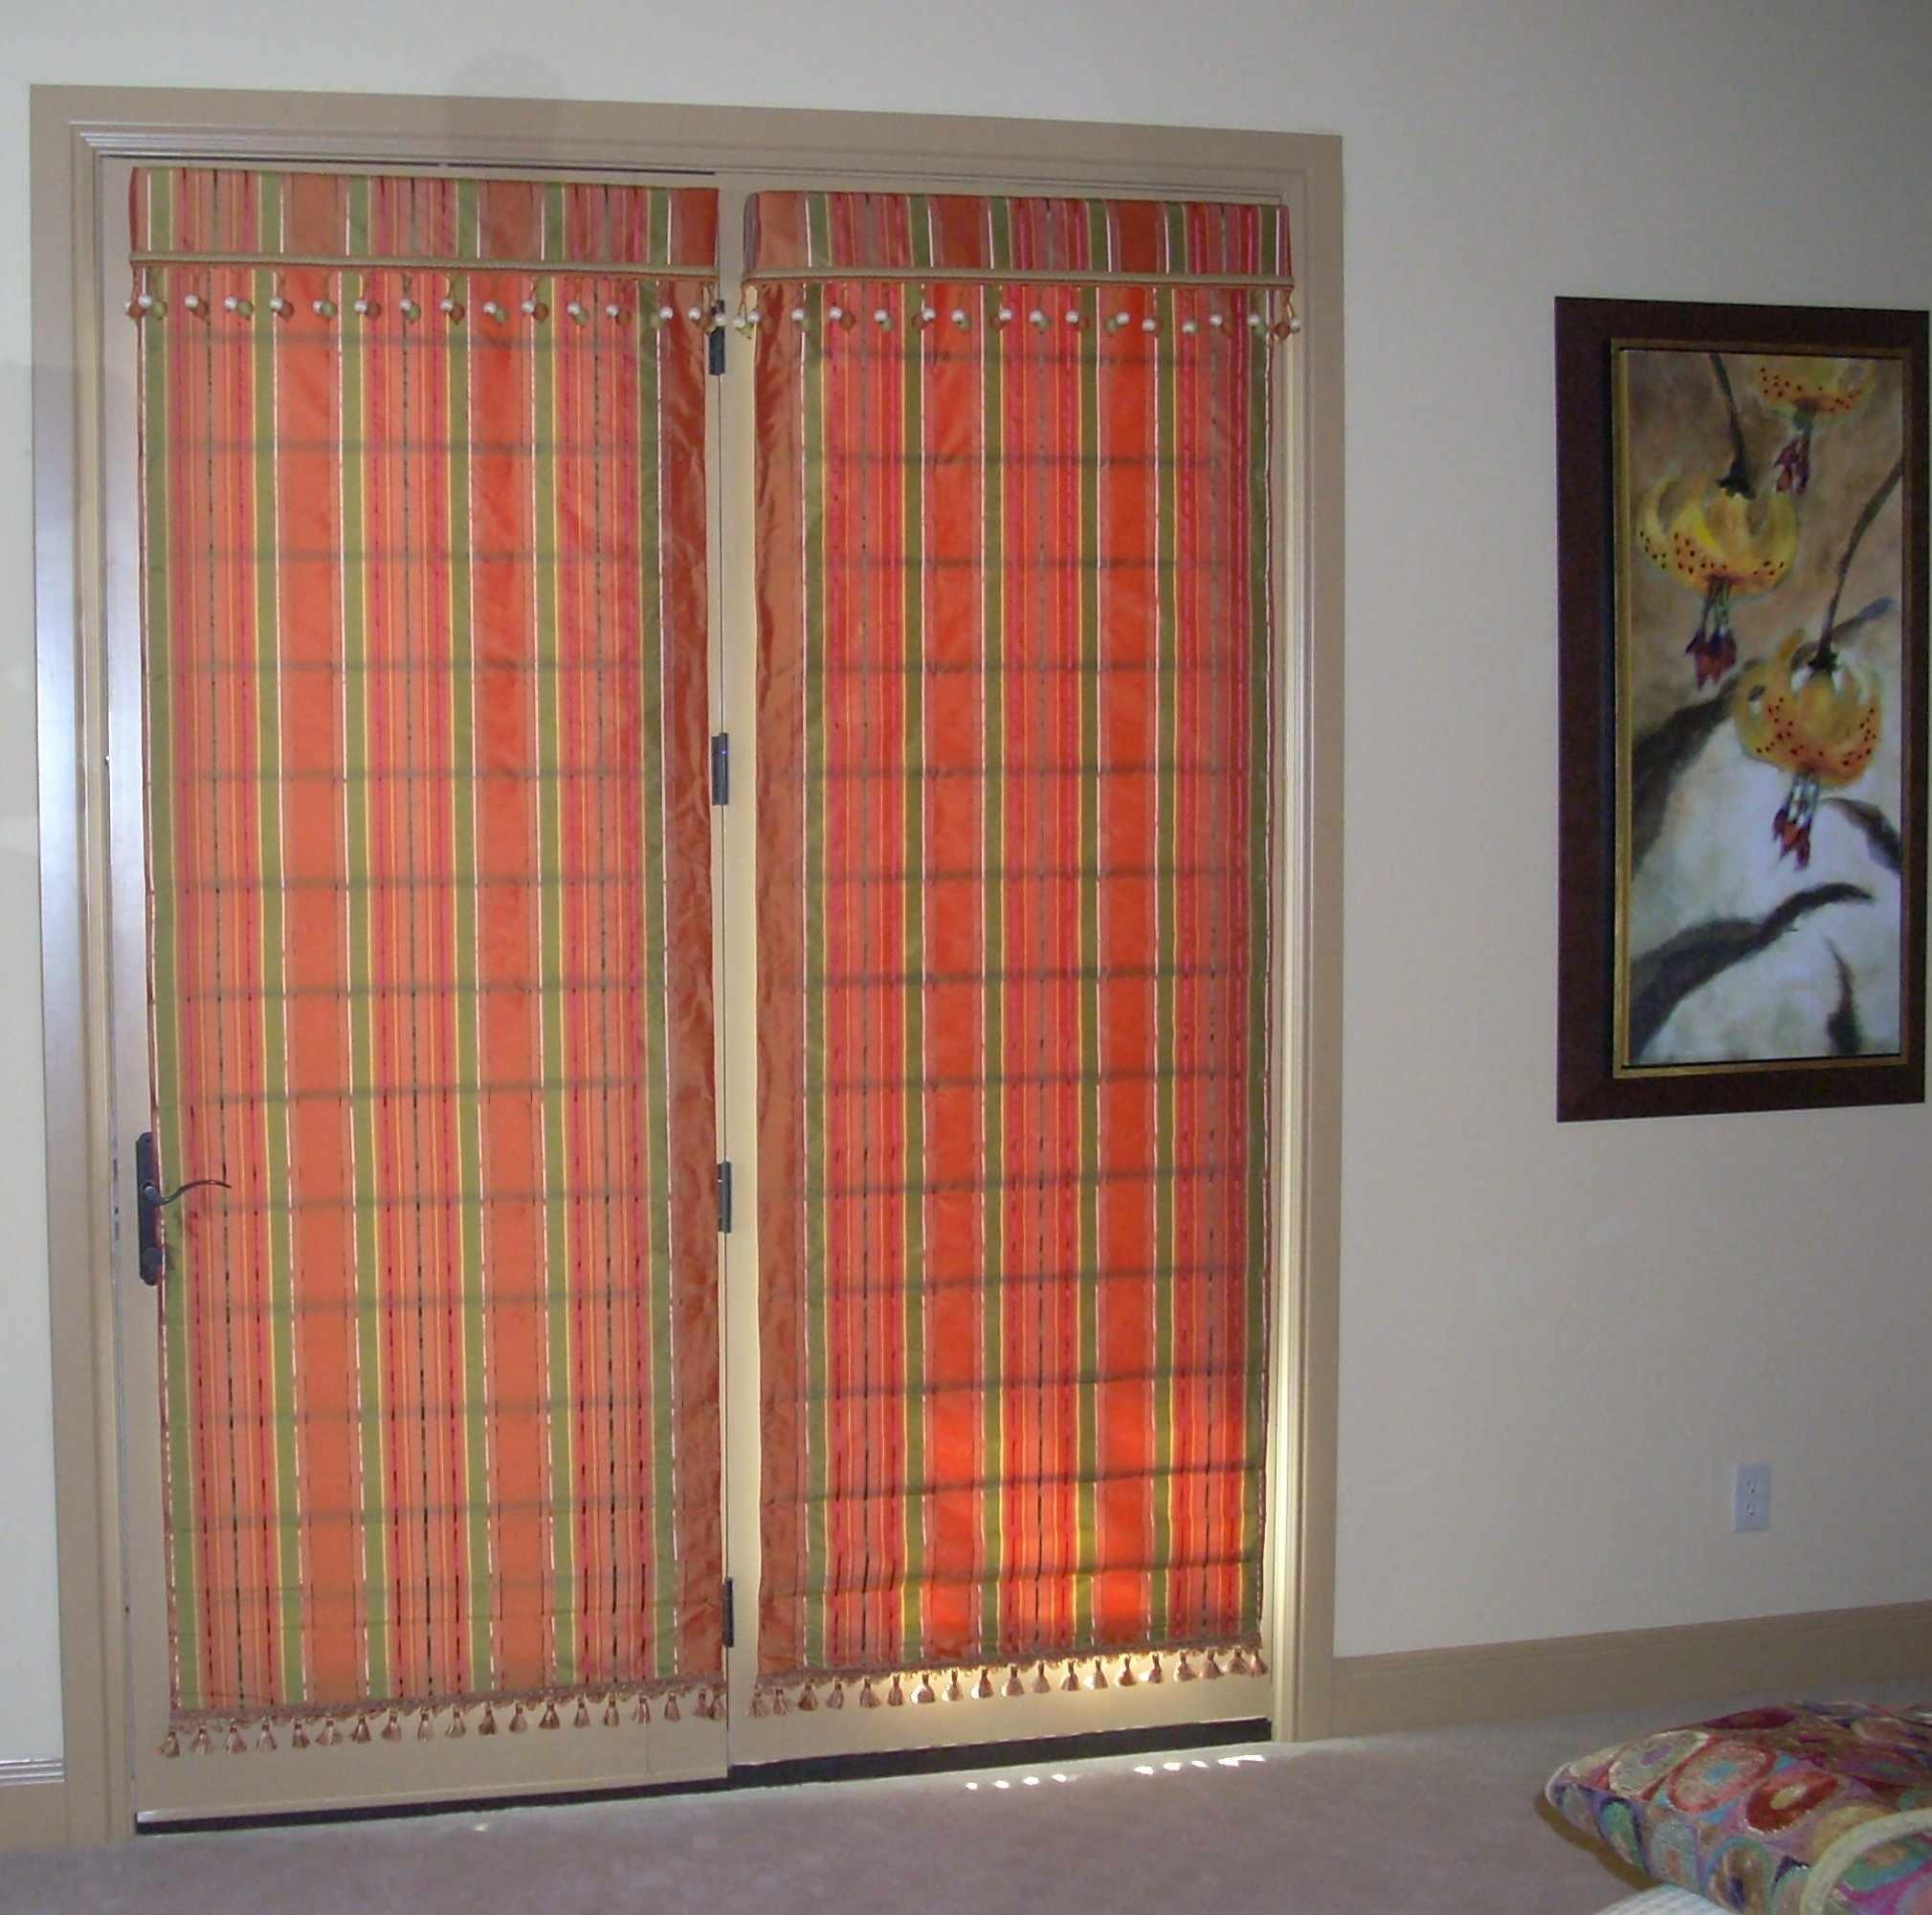 Double door window treatments window treatments design ideas Latest window treatments